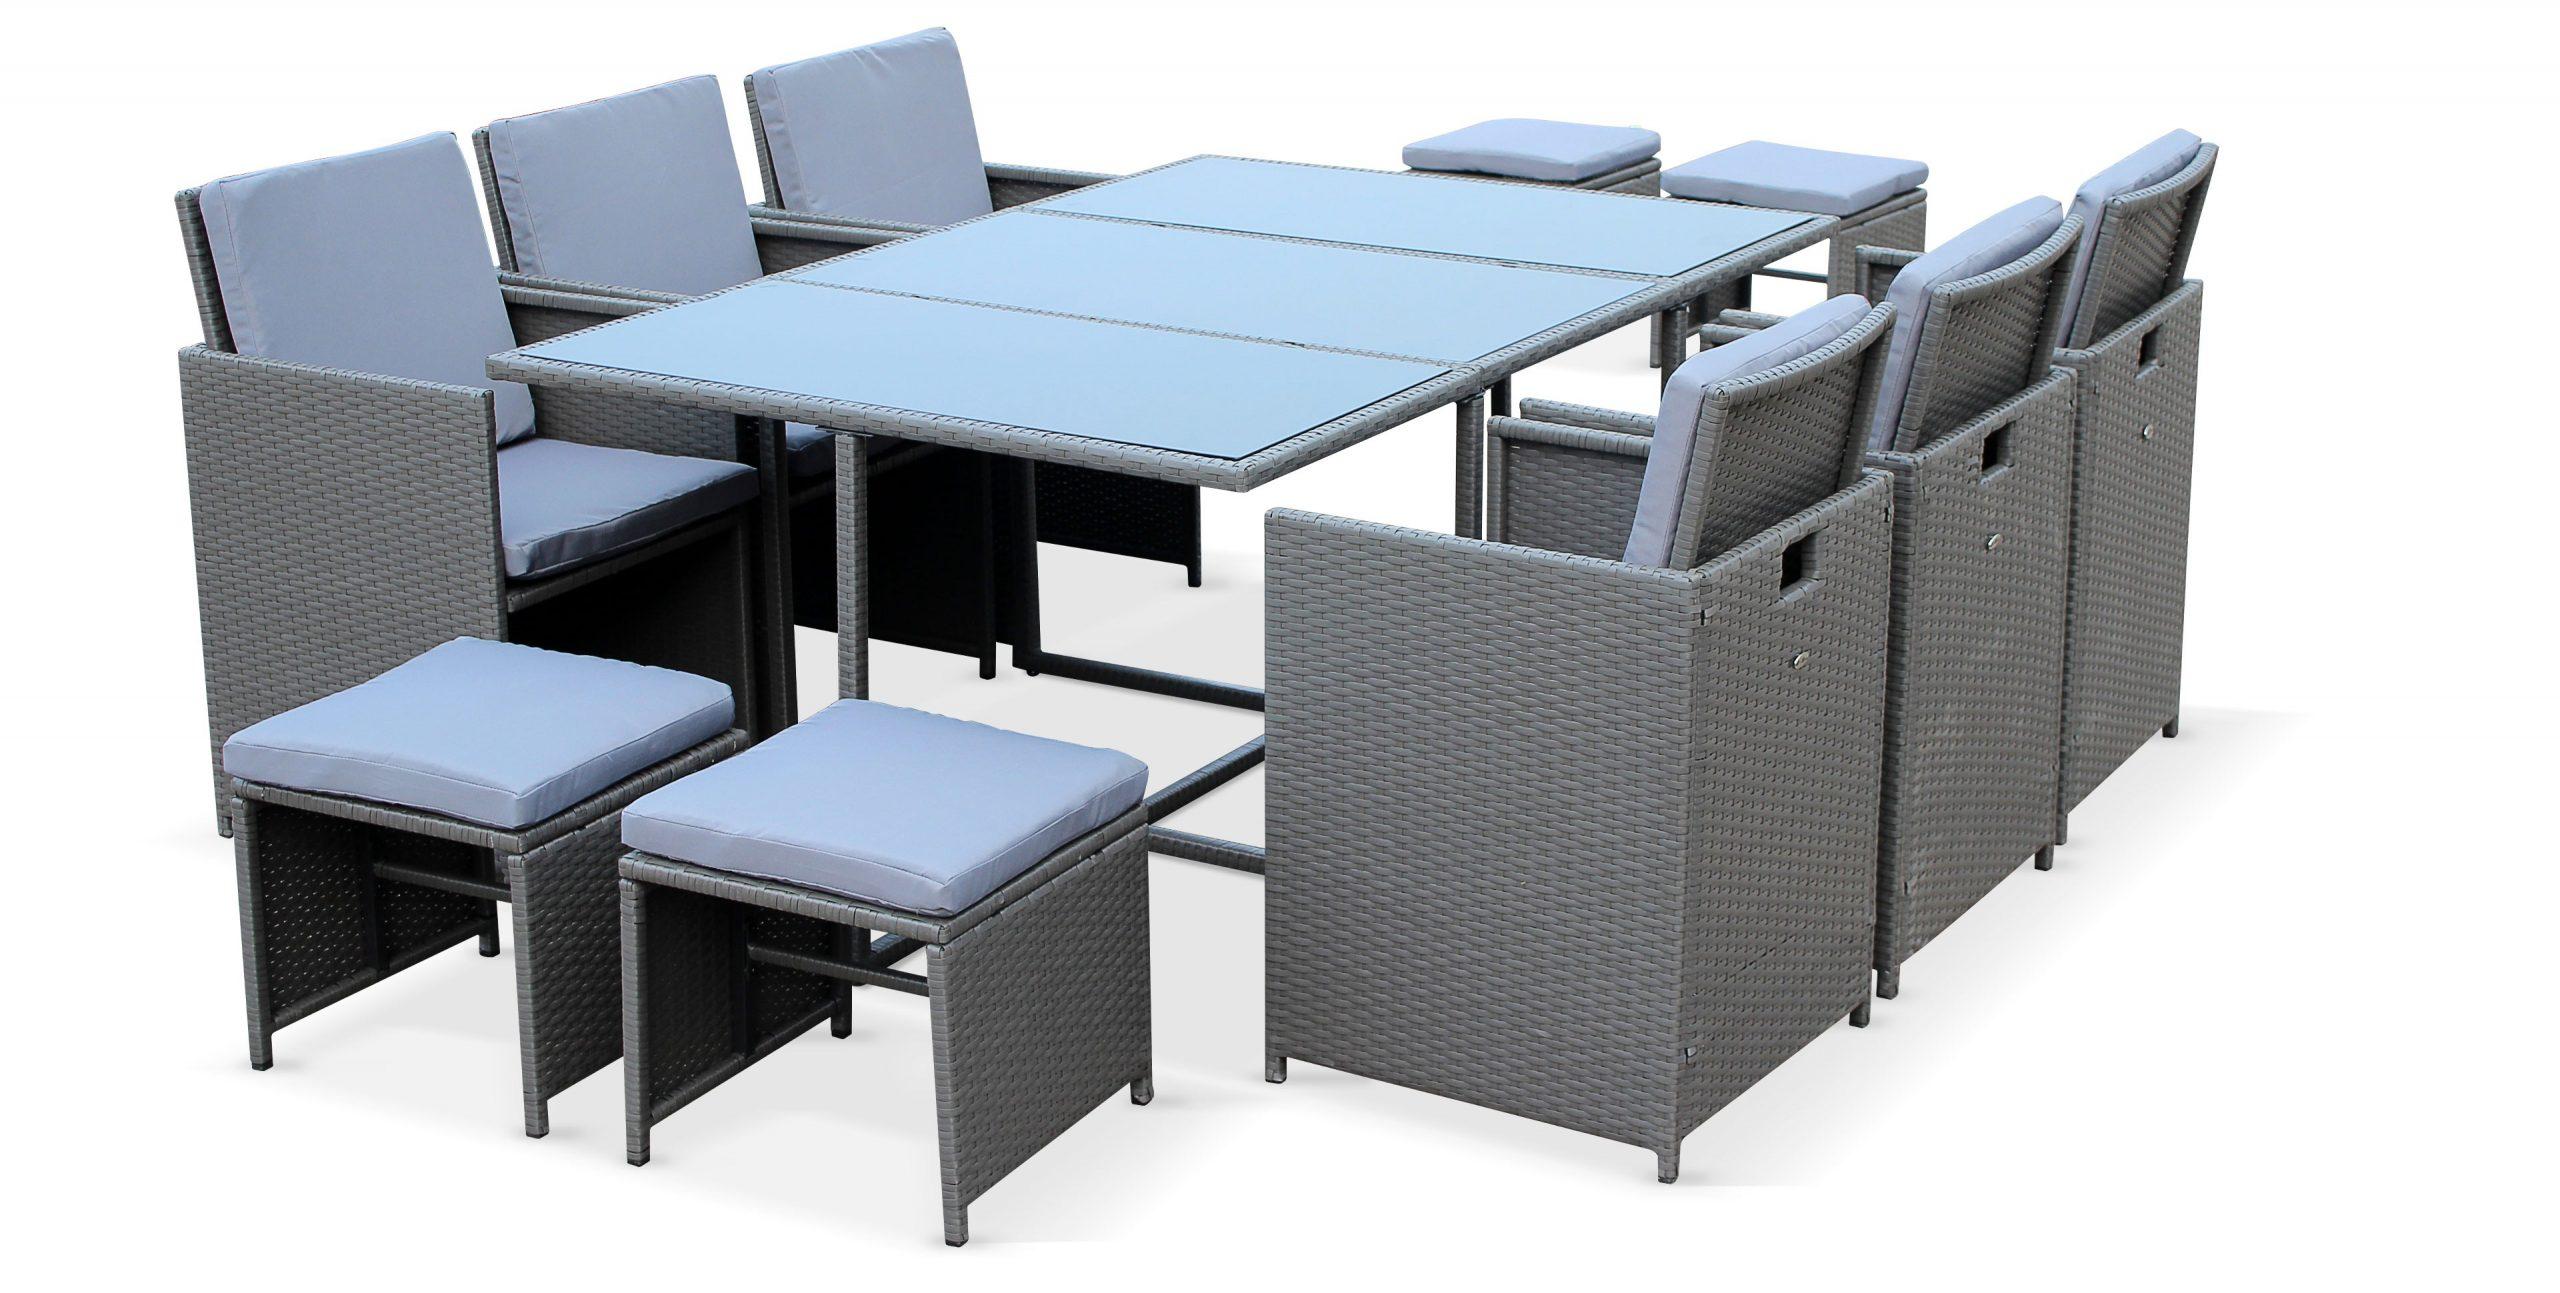 Ou Acheter Une Table De Jardin Ba7Df886 - Banphotphisai intérieur Salon De Jardin Alice Garden